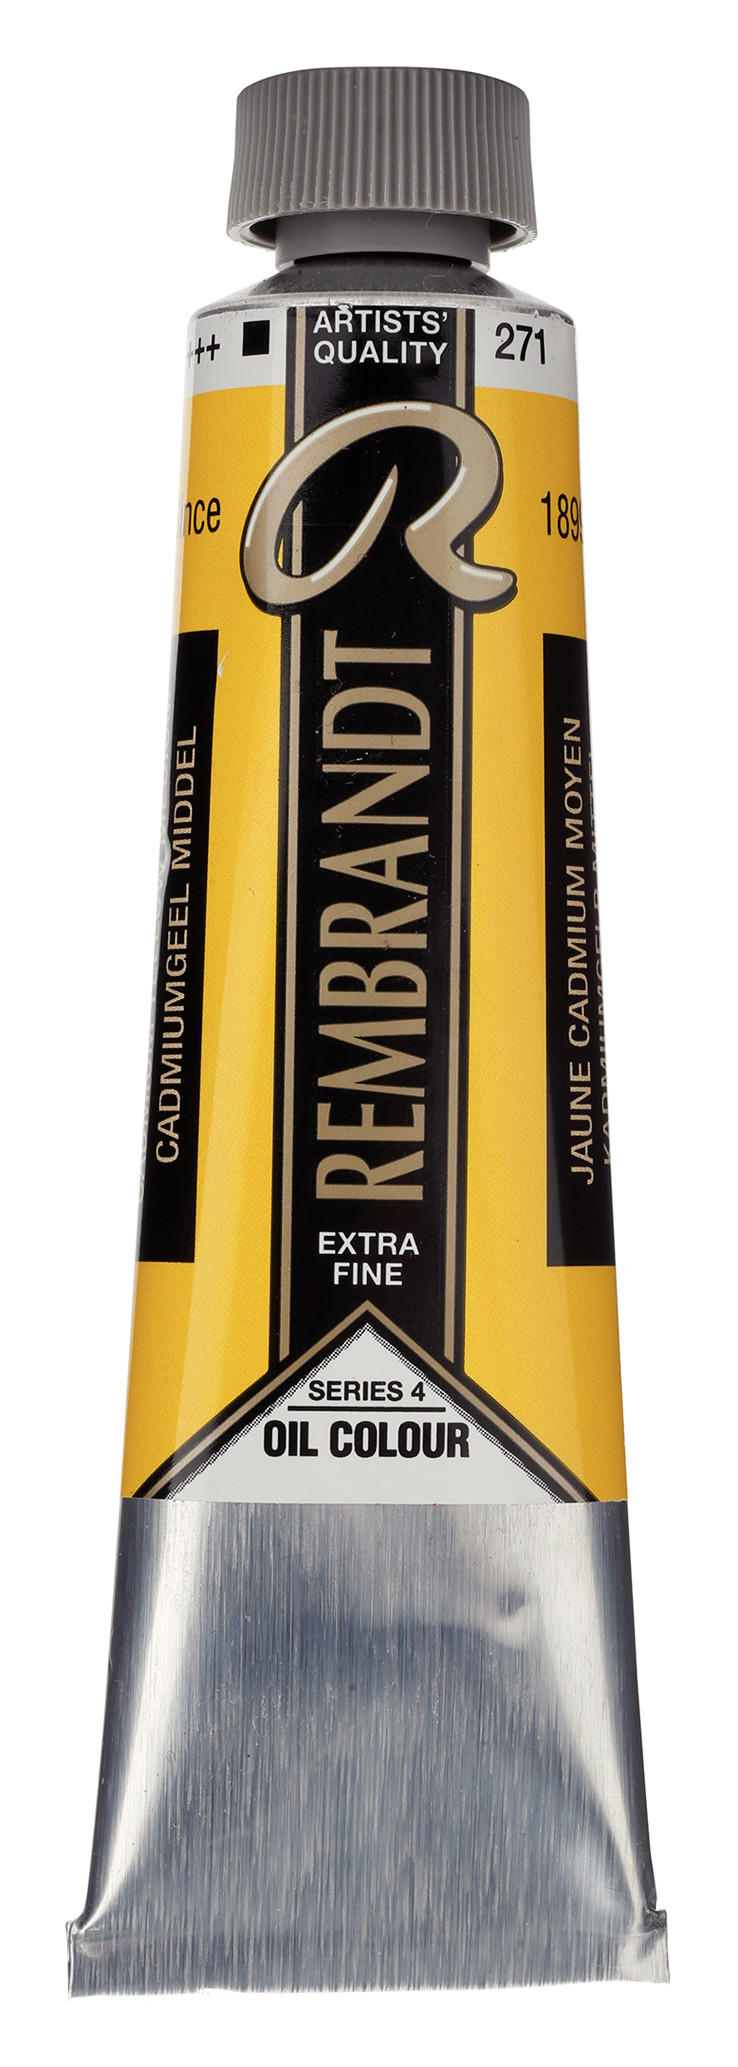 Rembrandt Oil colour Paint Cadmium Yellow Medium (271) 40ml Tube